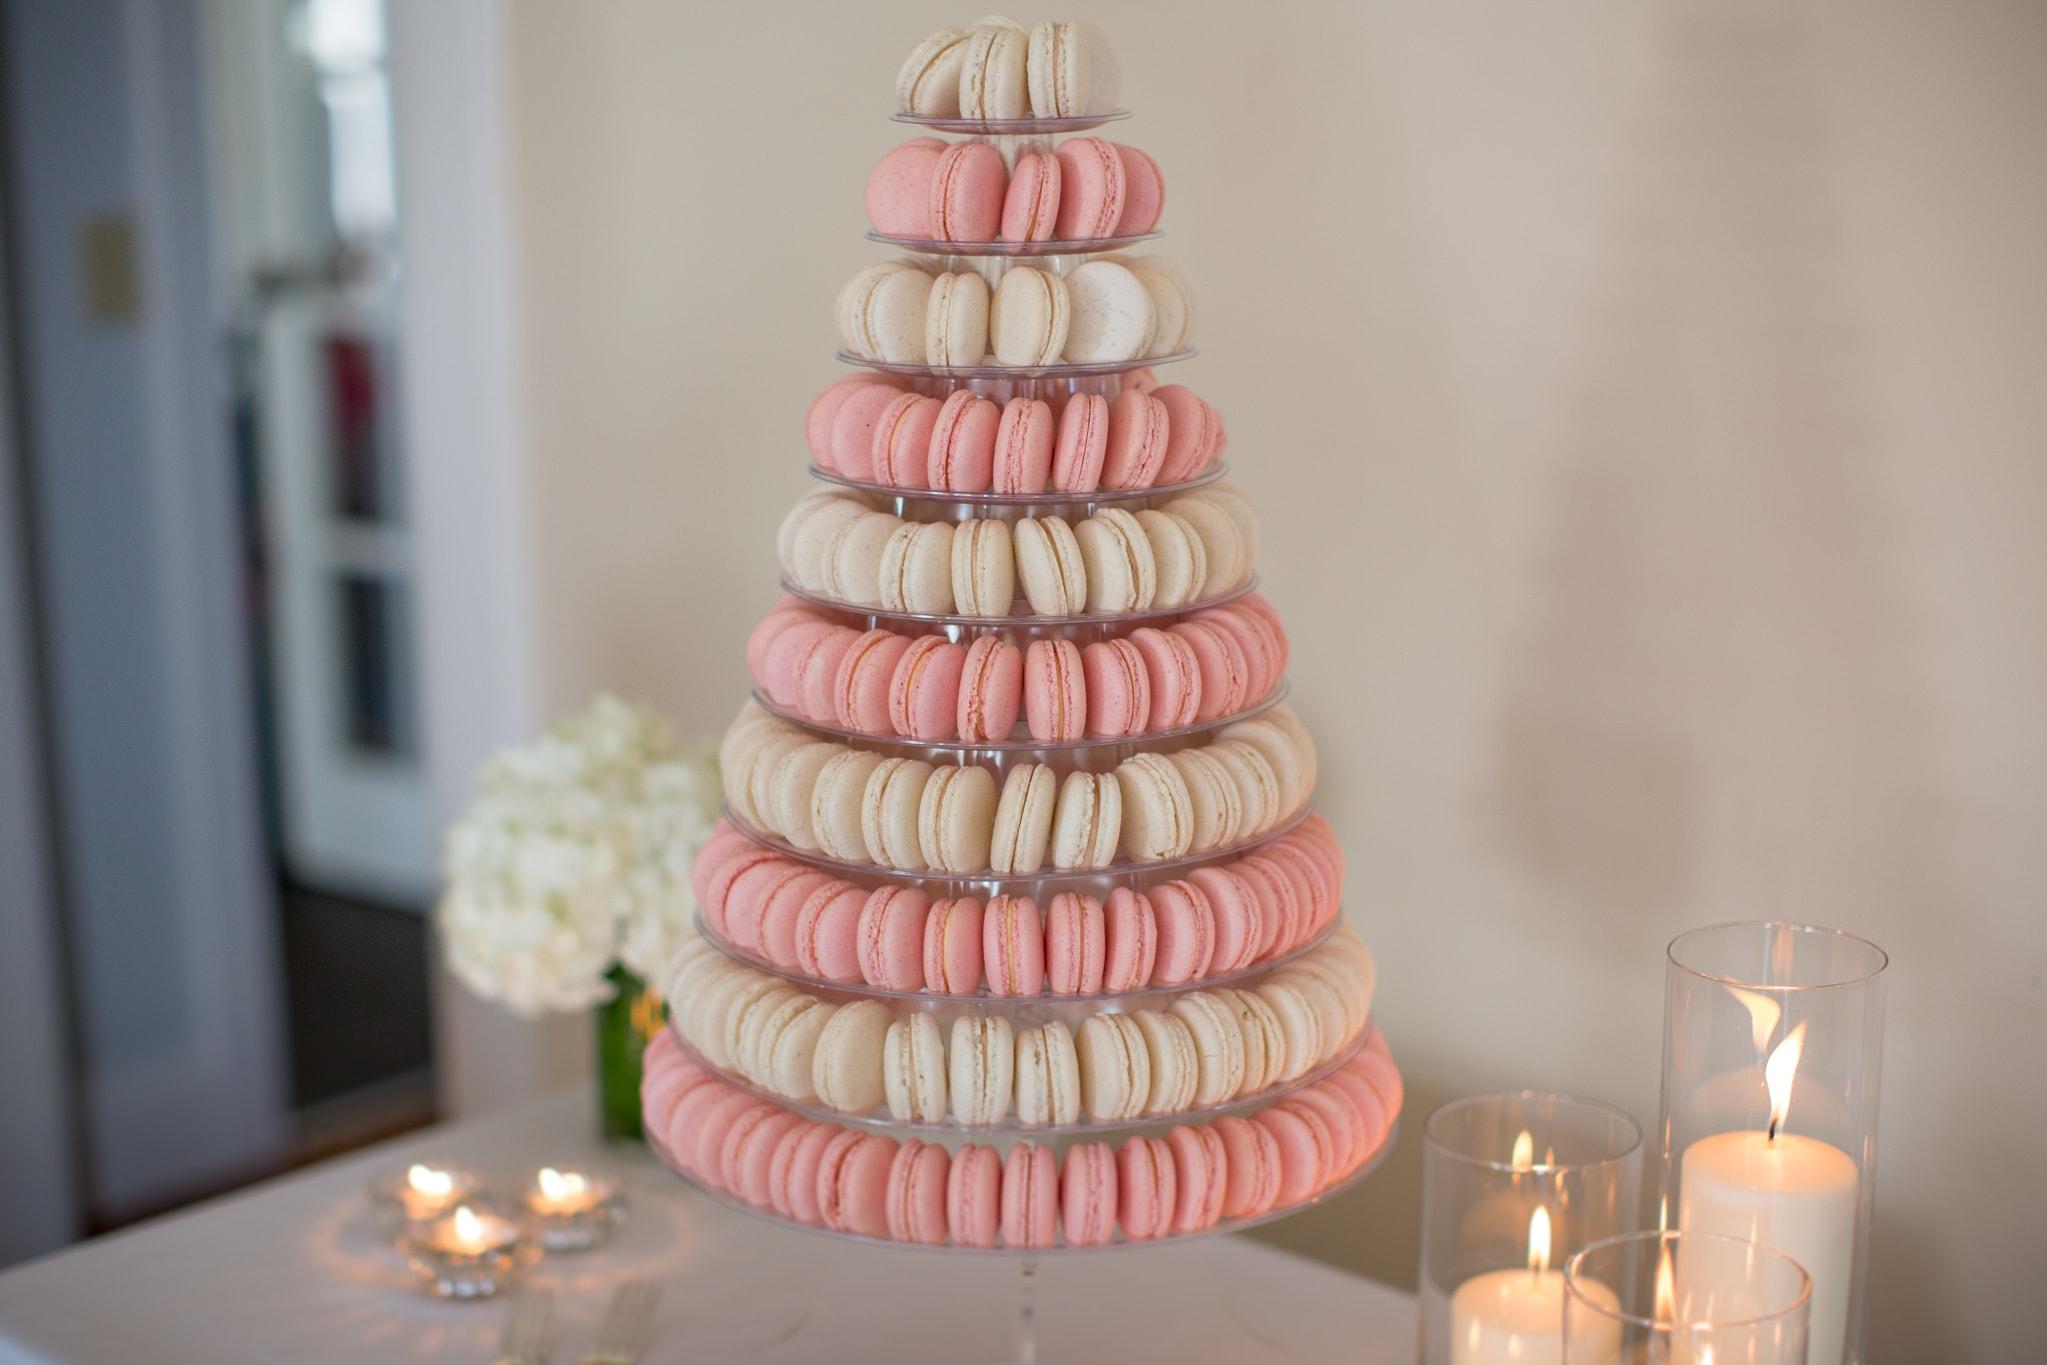 sobremesa-rosa-cha-de-panela-macaron-03-min